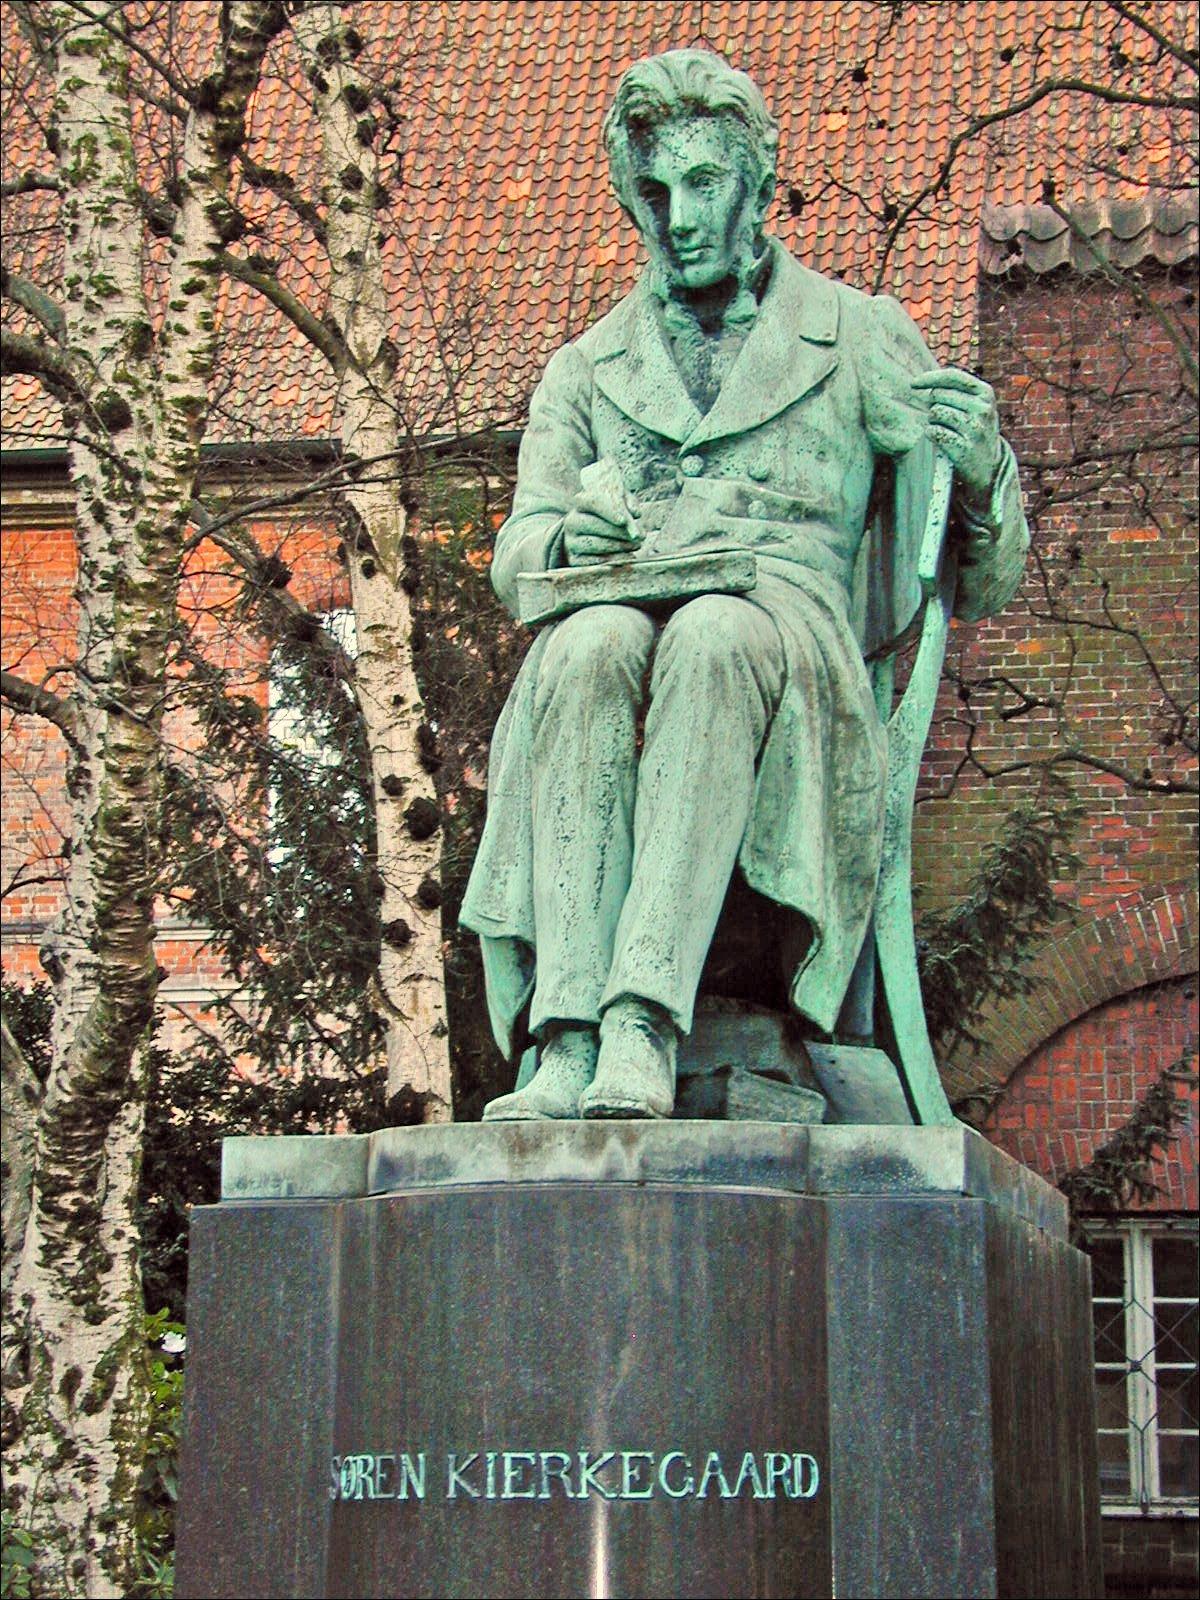 Soren-Kierkegaard-12.jpg